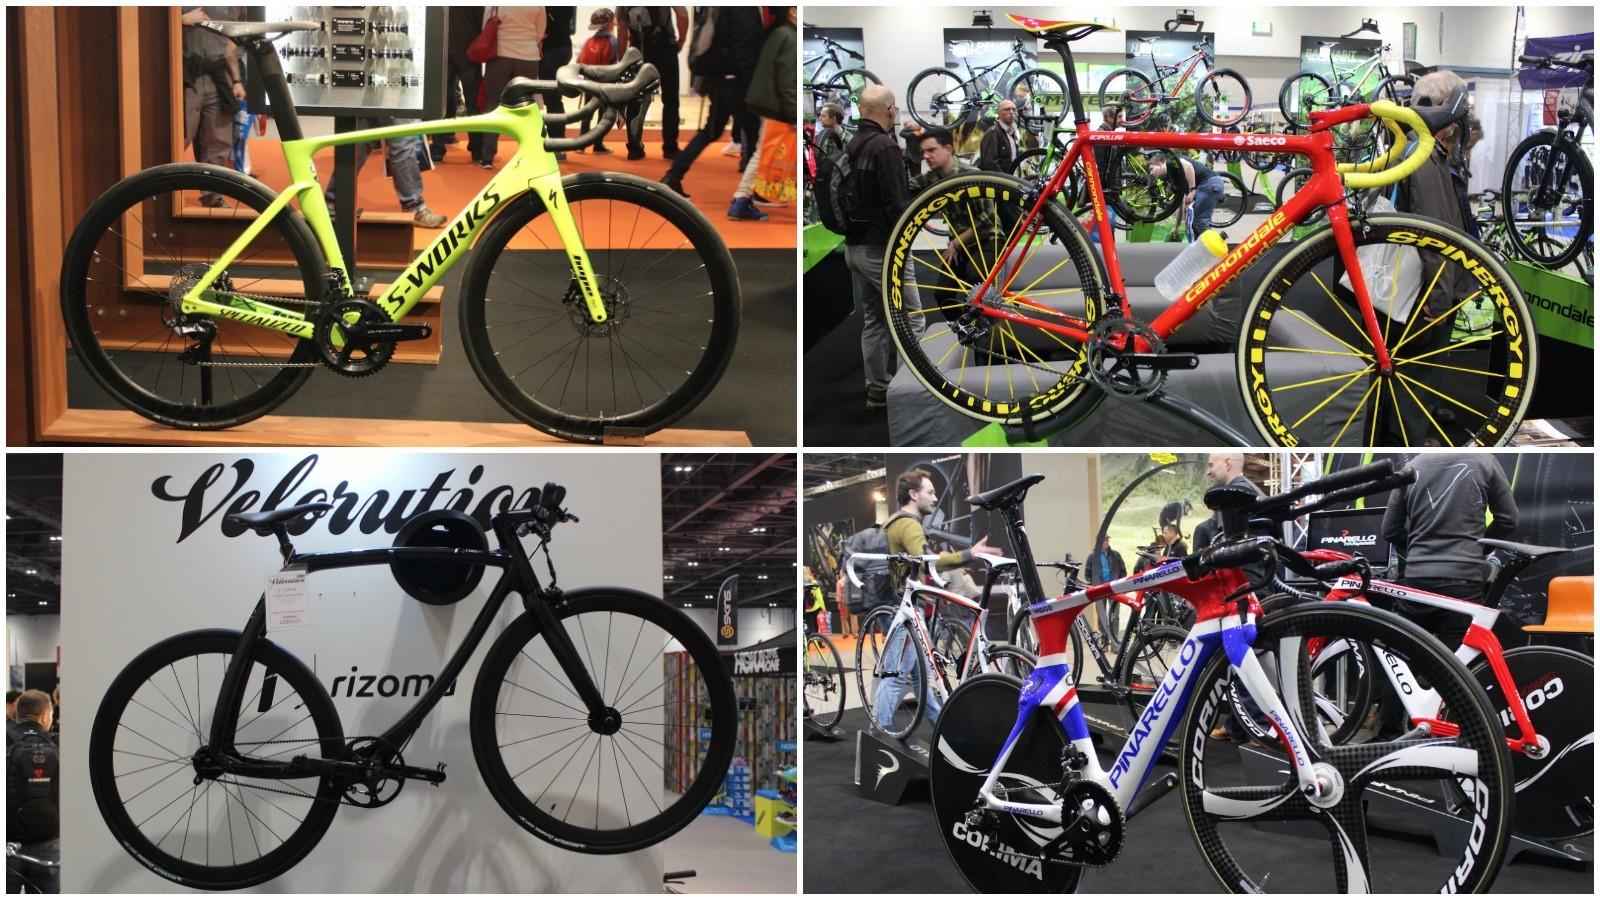 The London Bike Show 2017